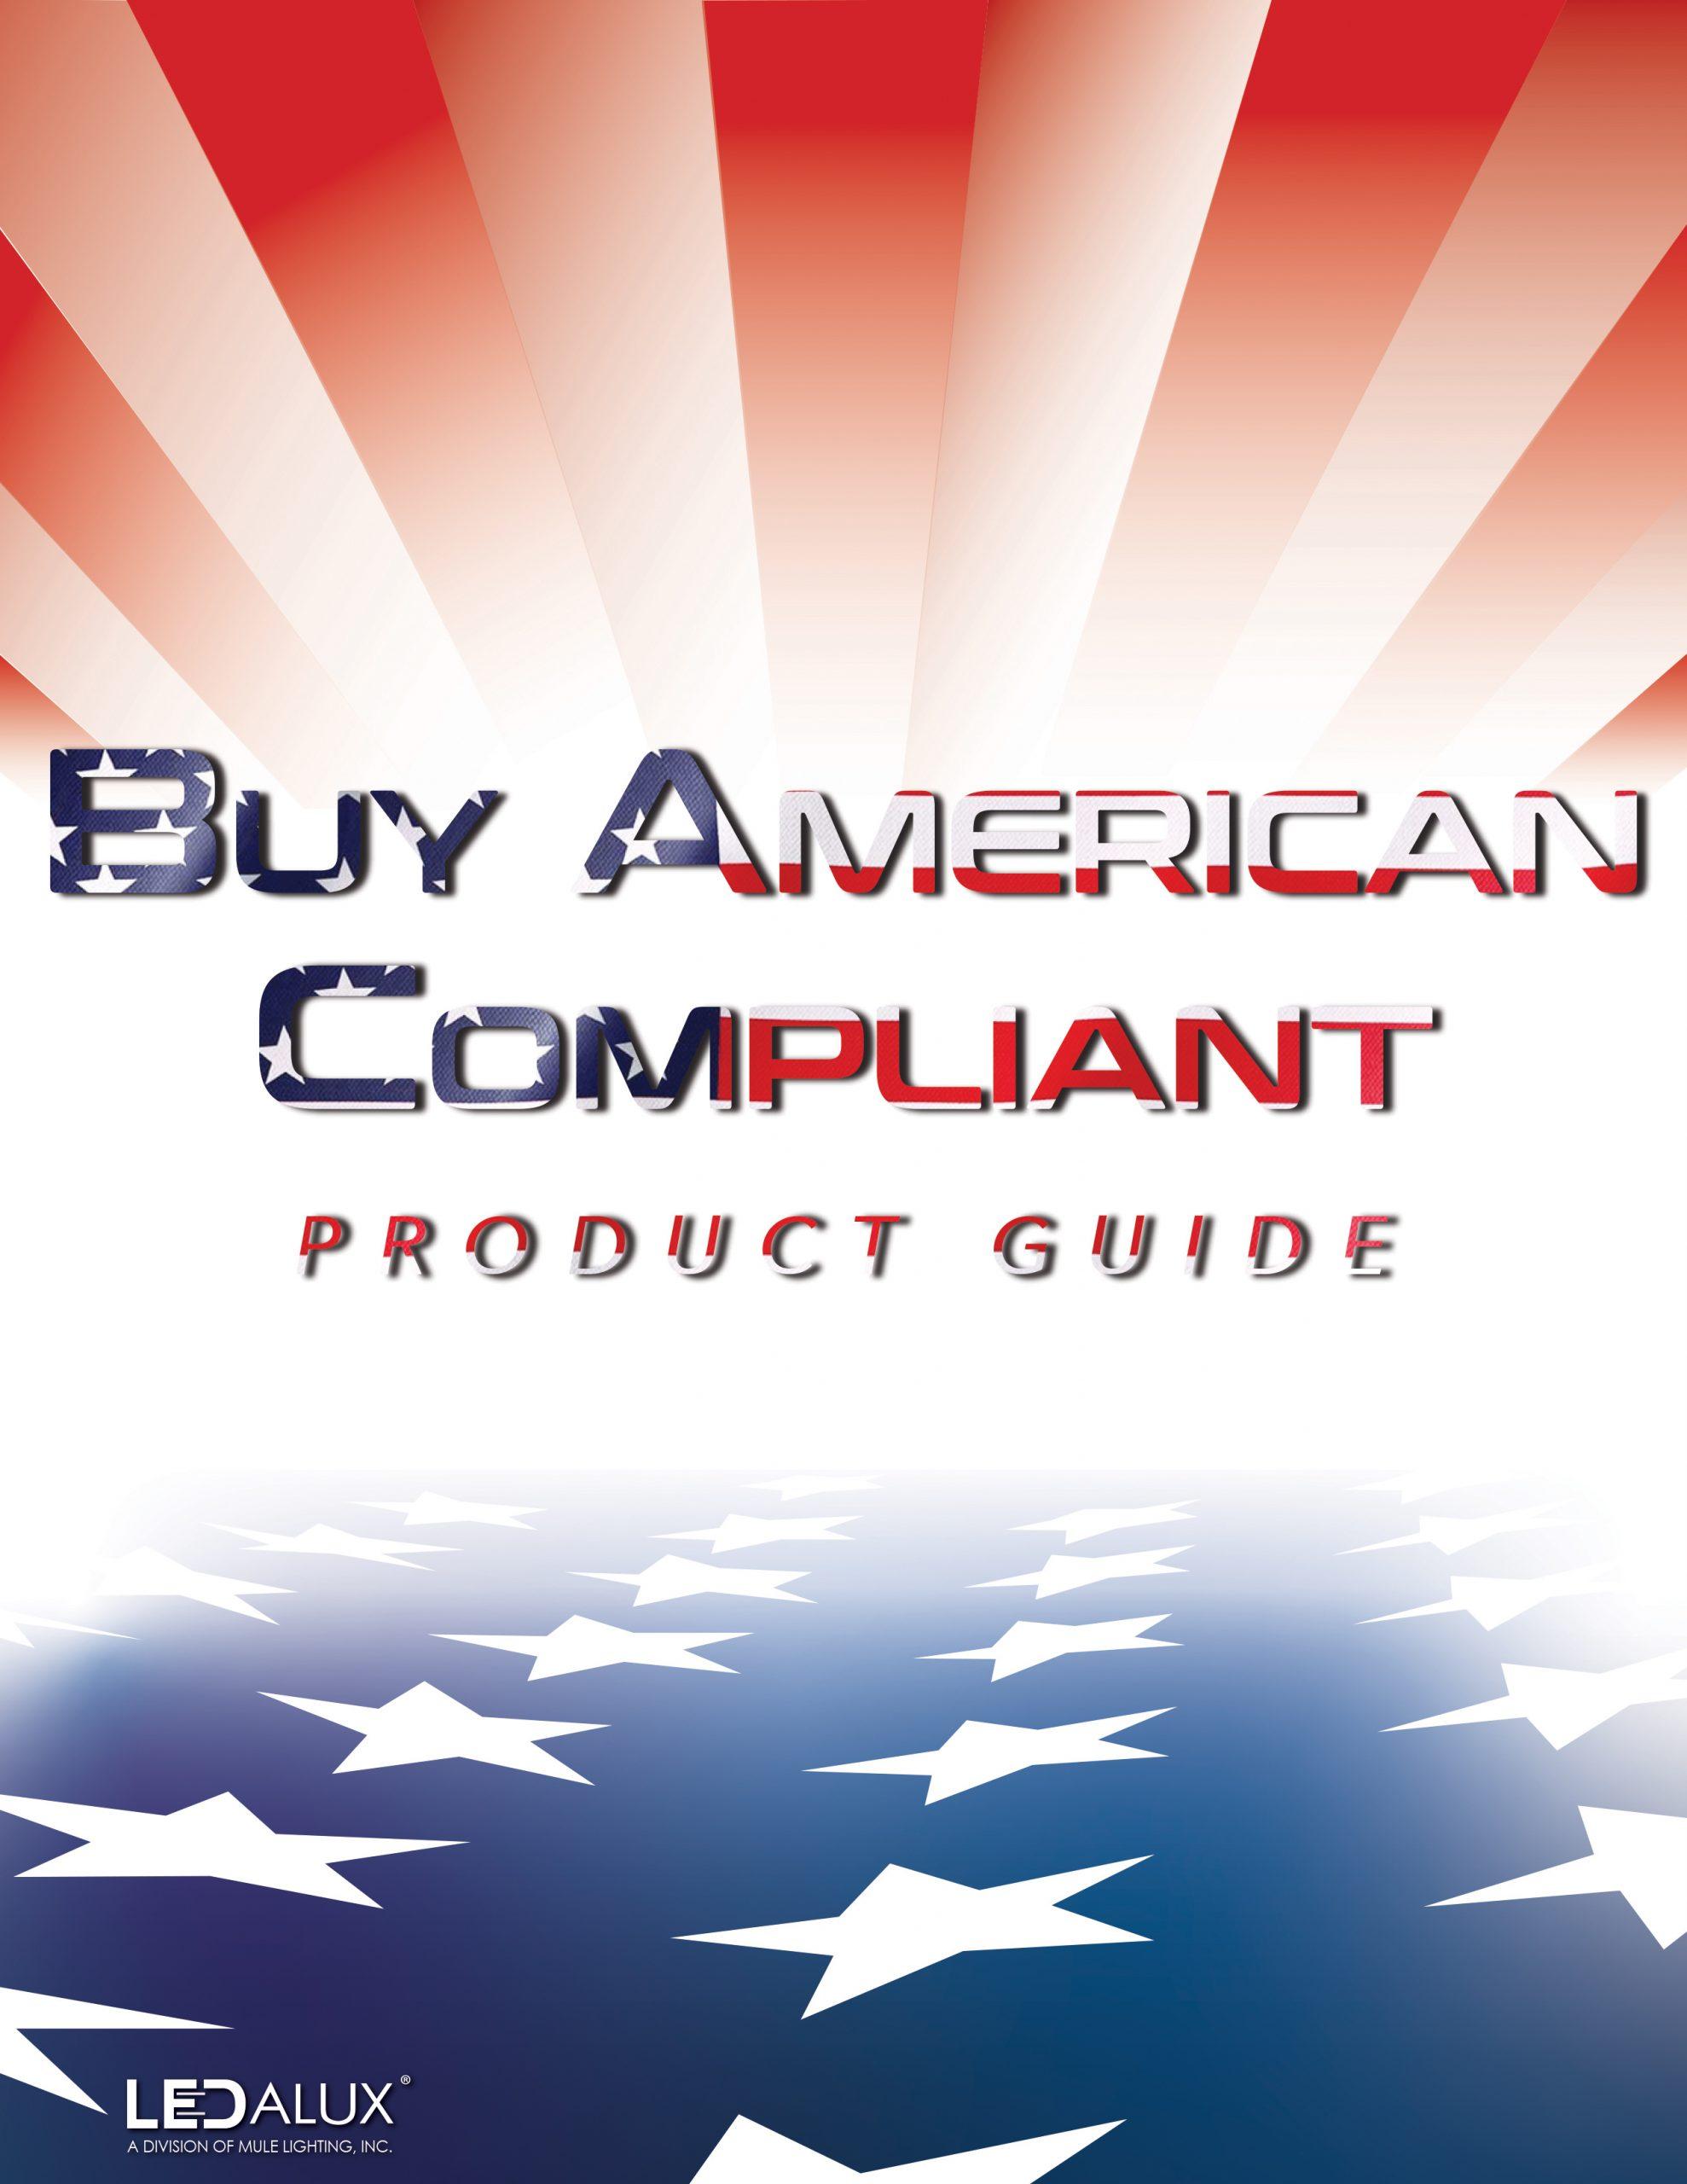 LEDalux Buy American Compliant Guide Literature